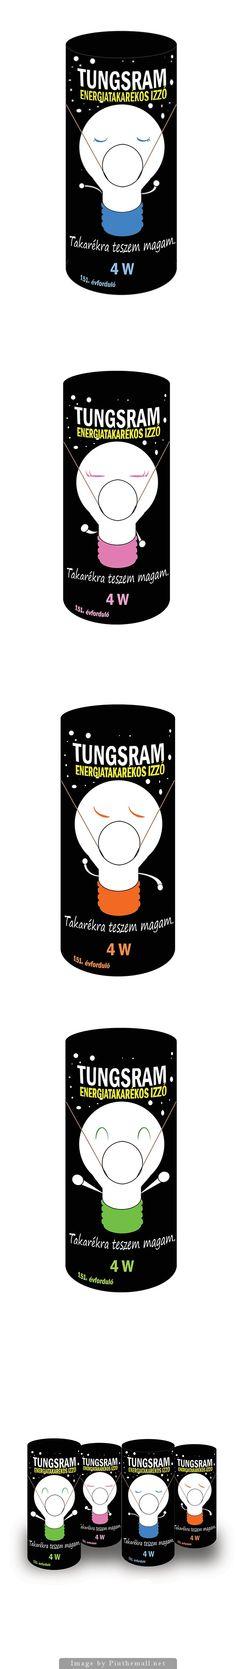 Tungsram Bulb Packaging Design Design Tech, Web Design, Graphic Design, Lightbulbs, Packaging Design Inspiration, A3, Cool Things To Make, Lantern, Hello Kitty